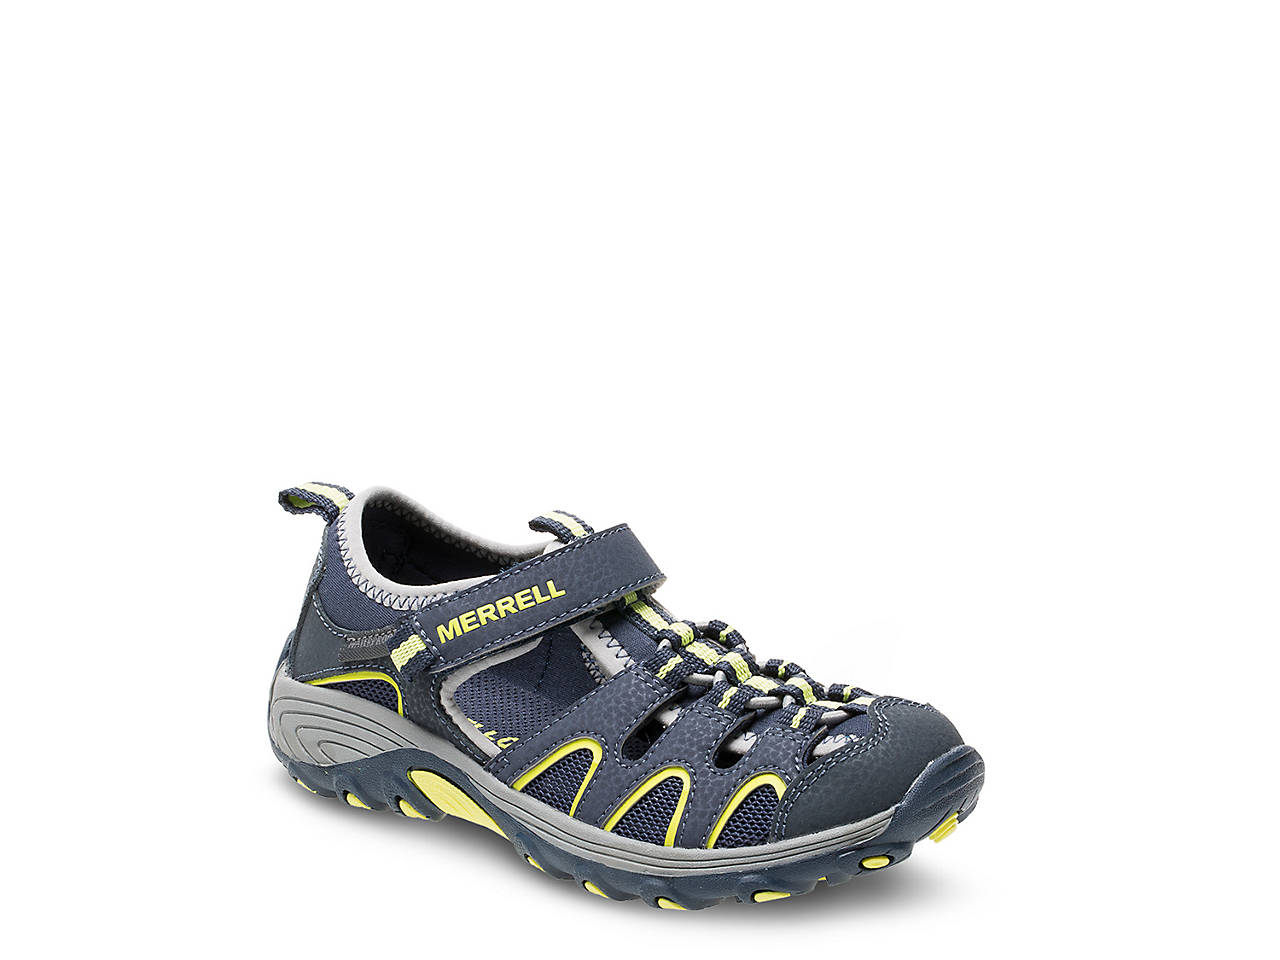 3a0cf889b50e Merrell Hydro H2O Hiker Toddler   Youth Sandal Kids Shoes